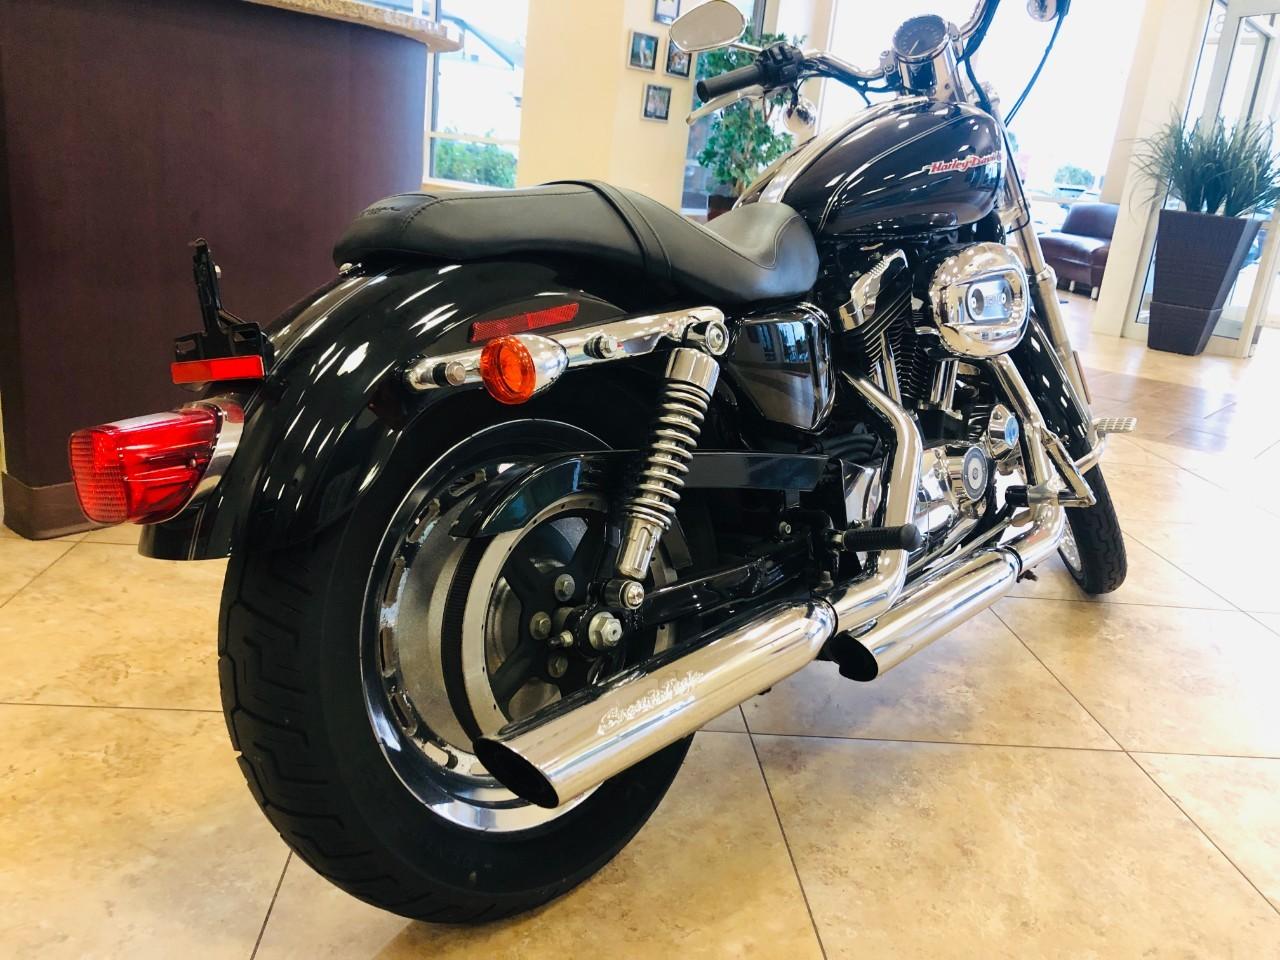 Sportster 1200 For Sale - Harley-Davidson Custom Motorcycles